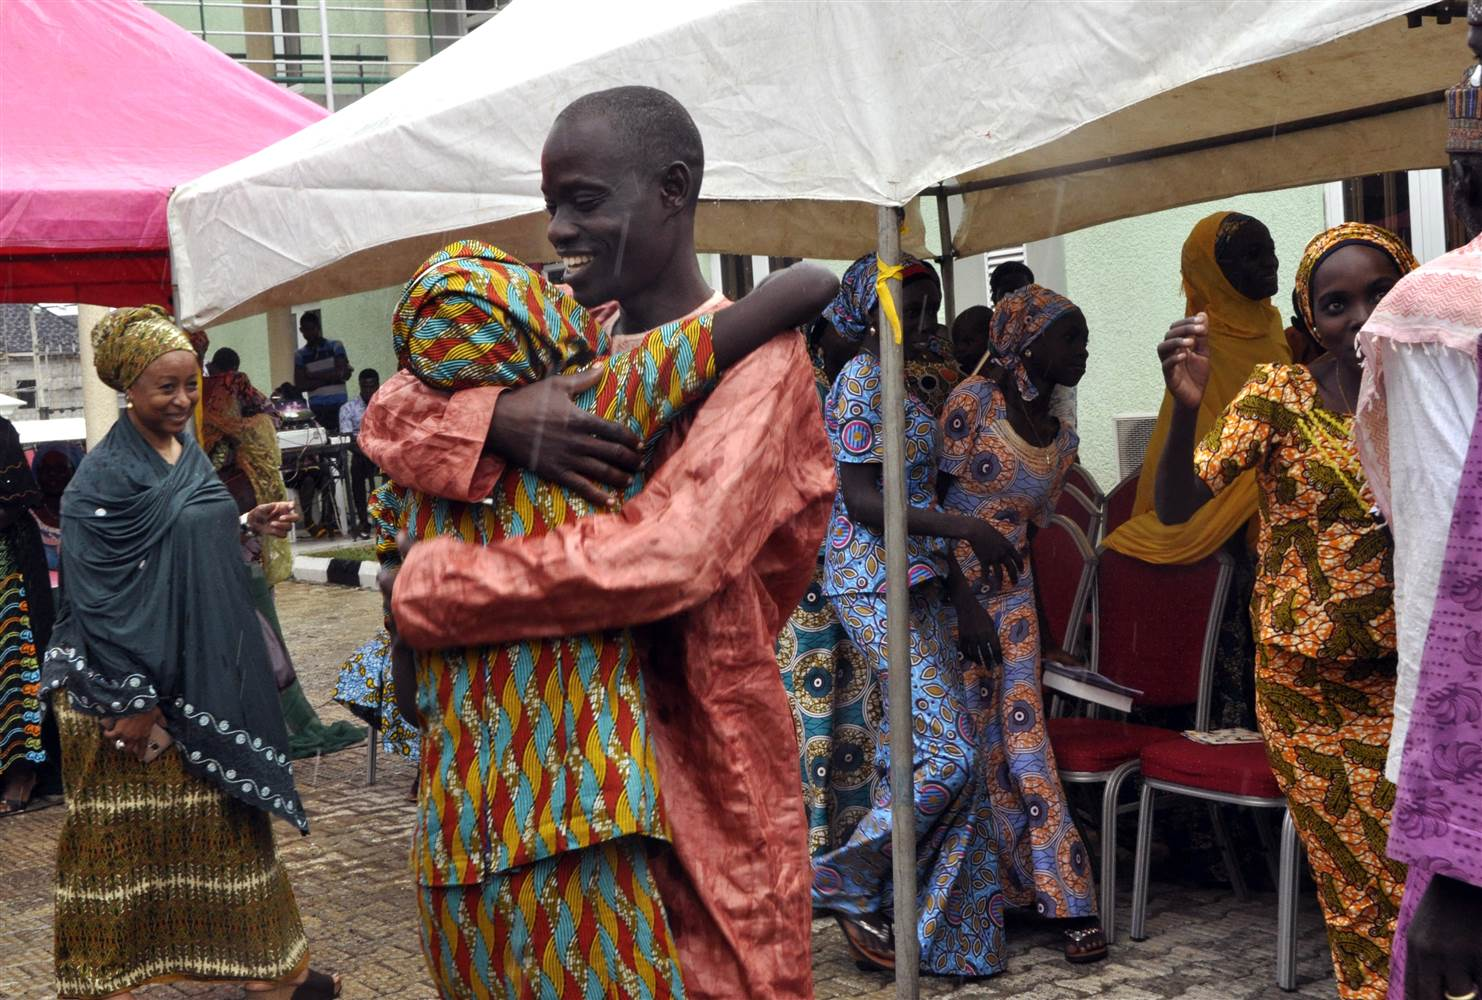 boko-harm-ap-photo_nbc-news_164909